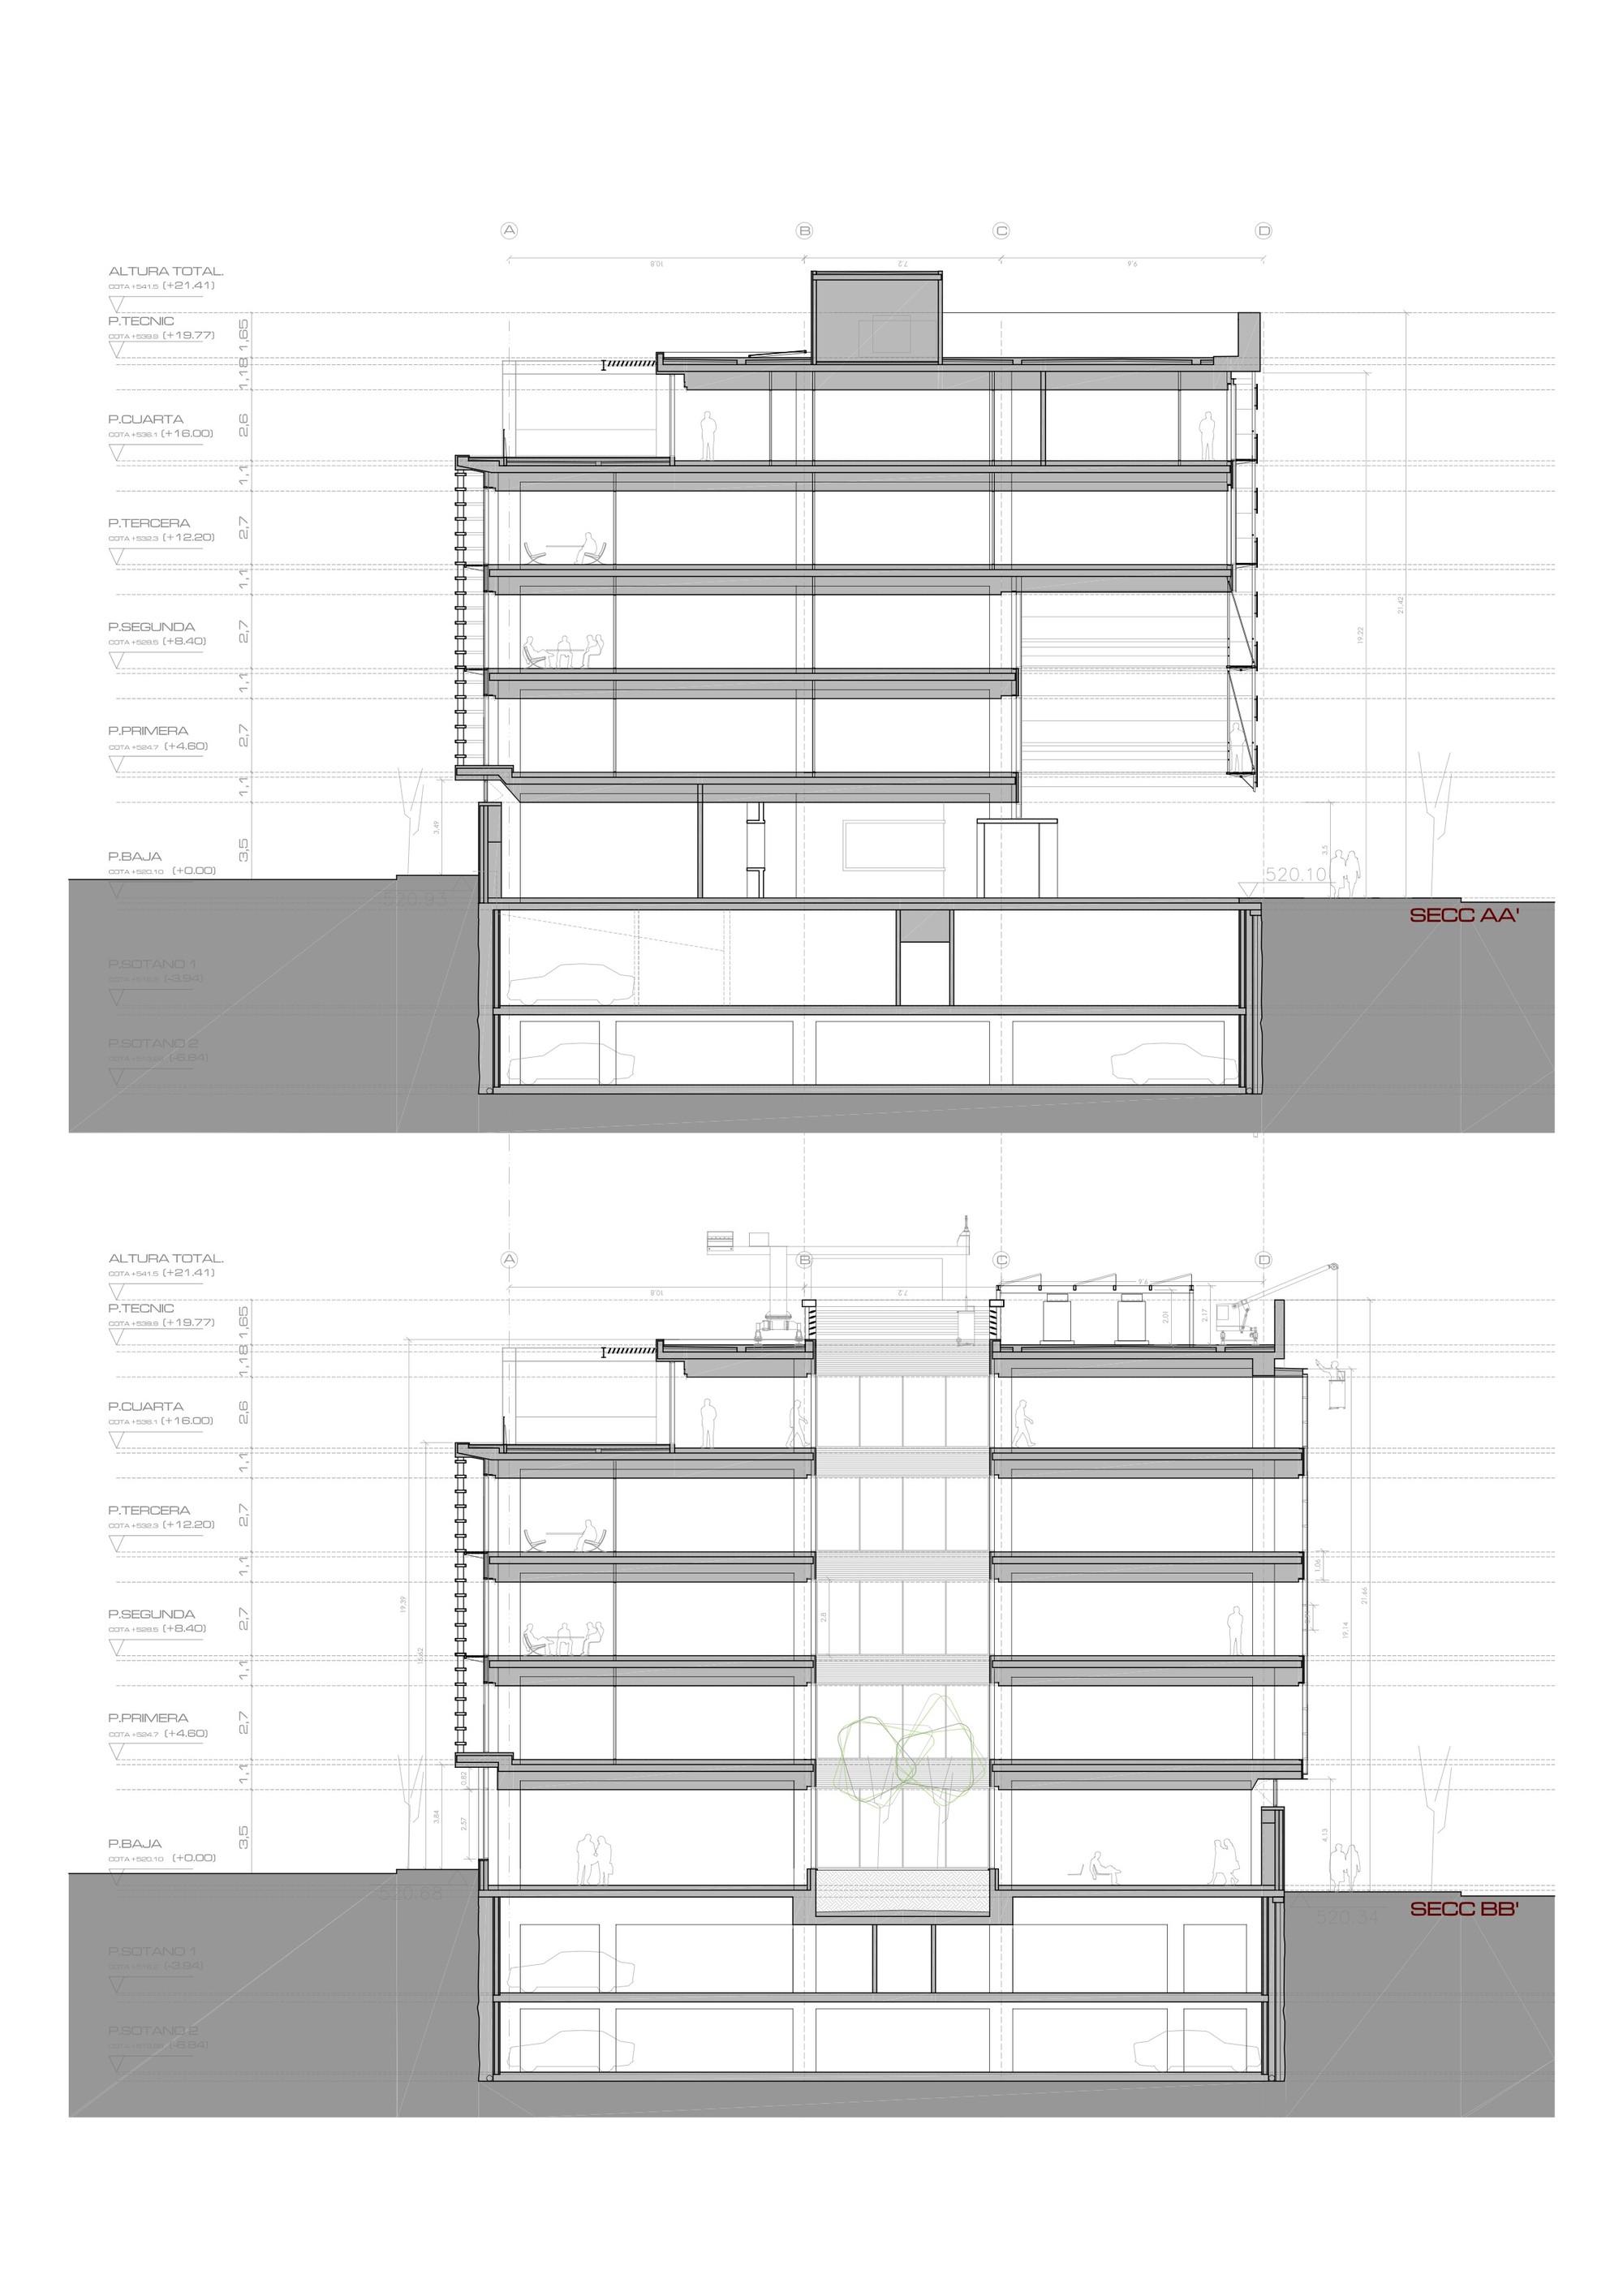 Galer a de edificio de oficinas en vitoria lh14 arquitectos 18 - Arquitectos en vitoria ...